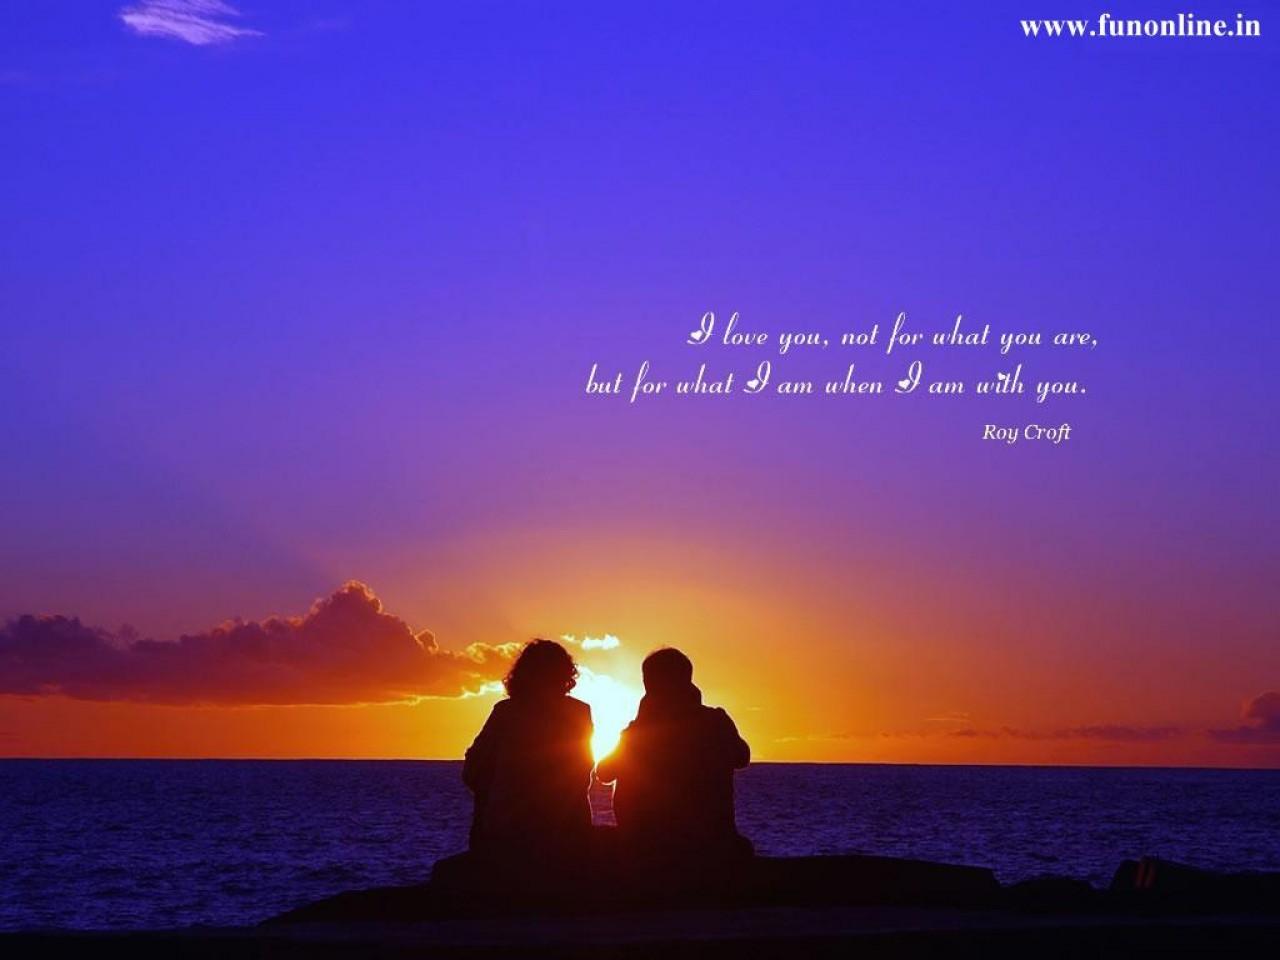 love quotes sad love quotes sad love quotes sad love quotes sad love 1280x960